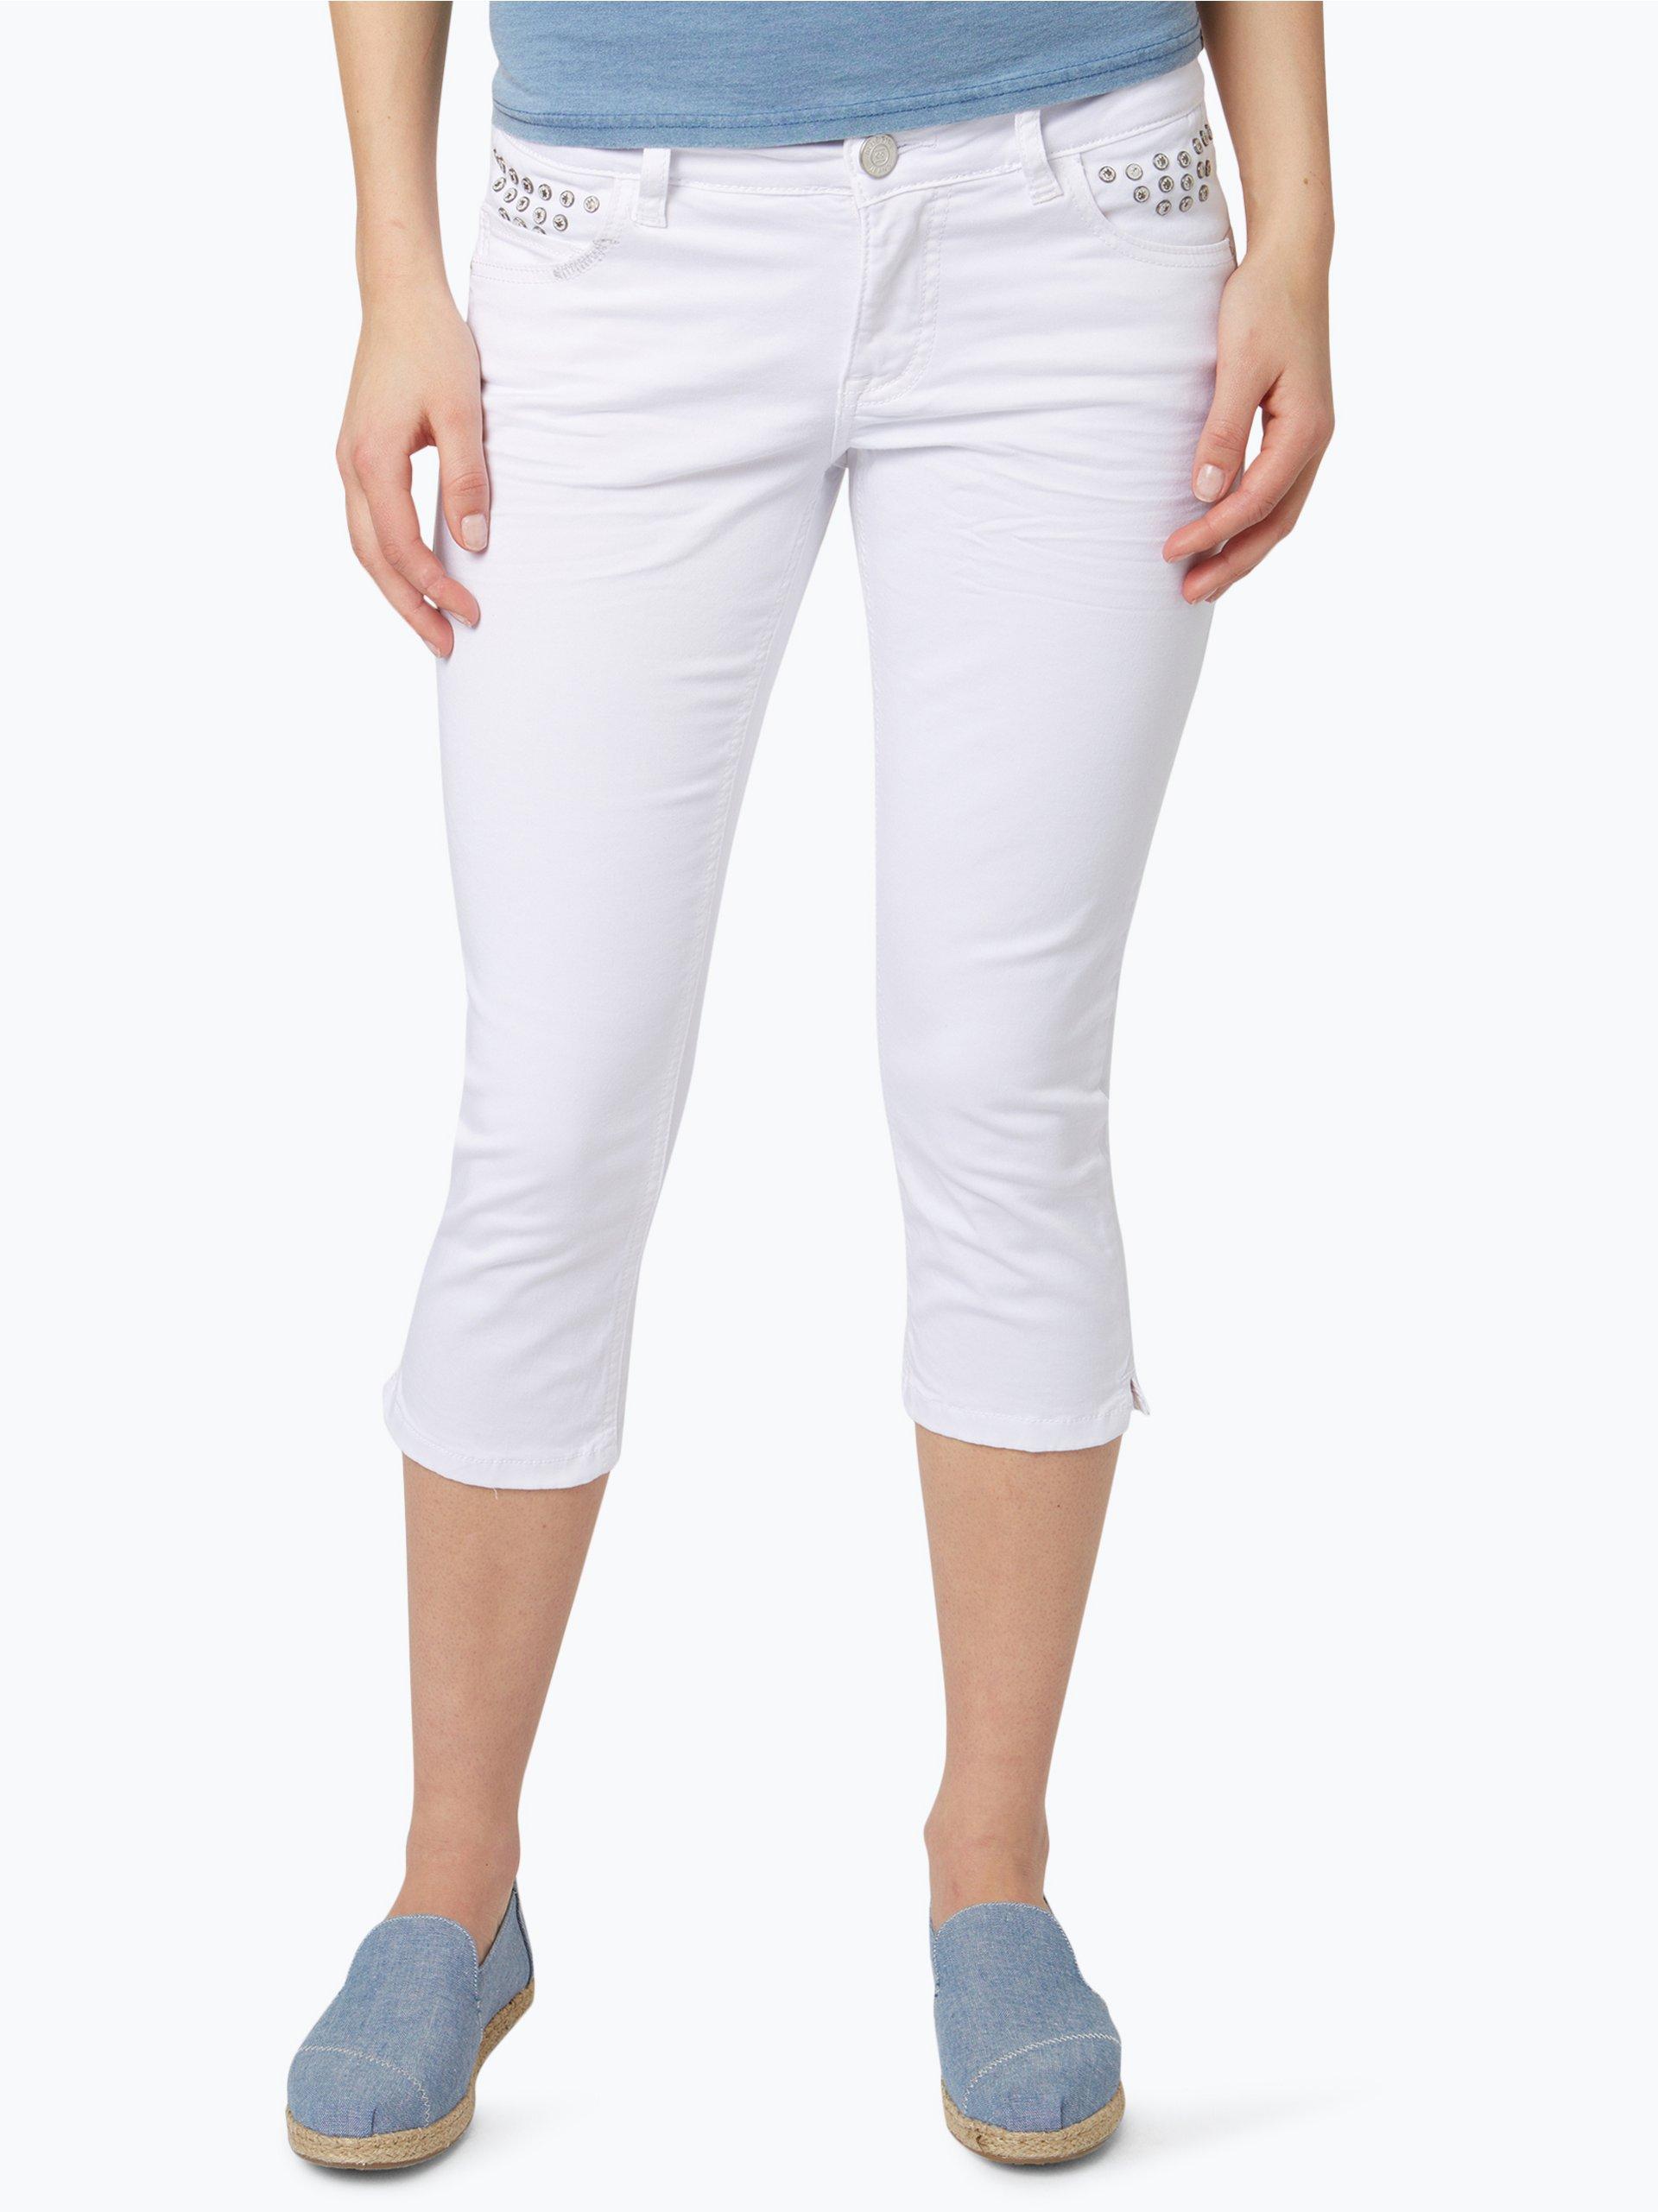 blue fire damen jeans tyra capri 2 online kaufen peek und cloppenburg de. Black Bedroom Furniture Sets. Home Design Ideas